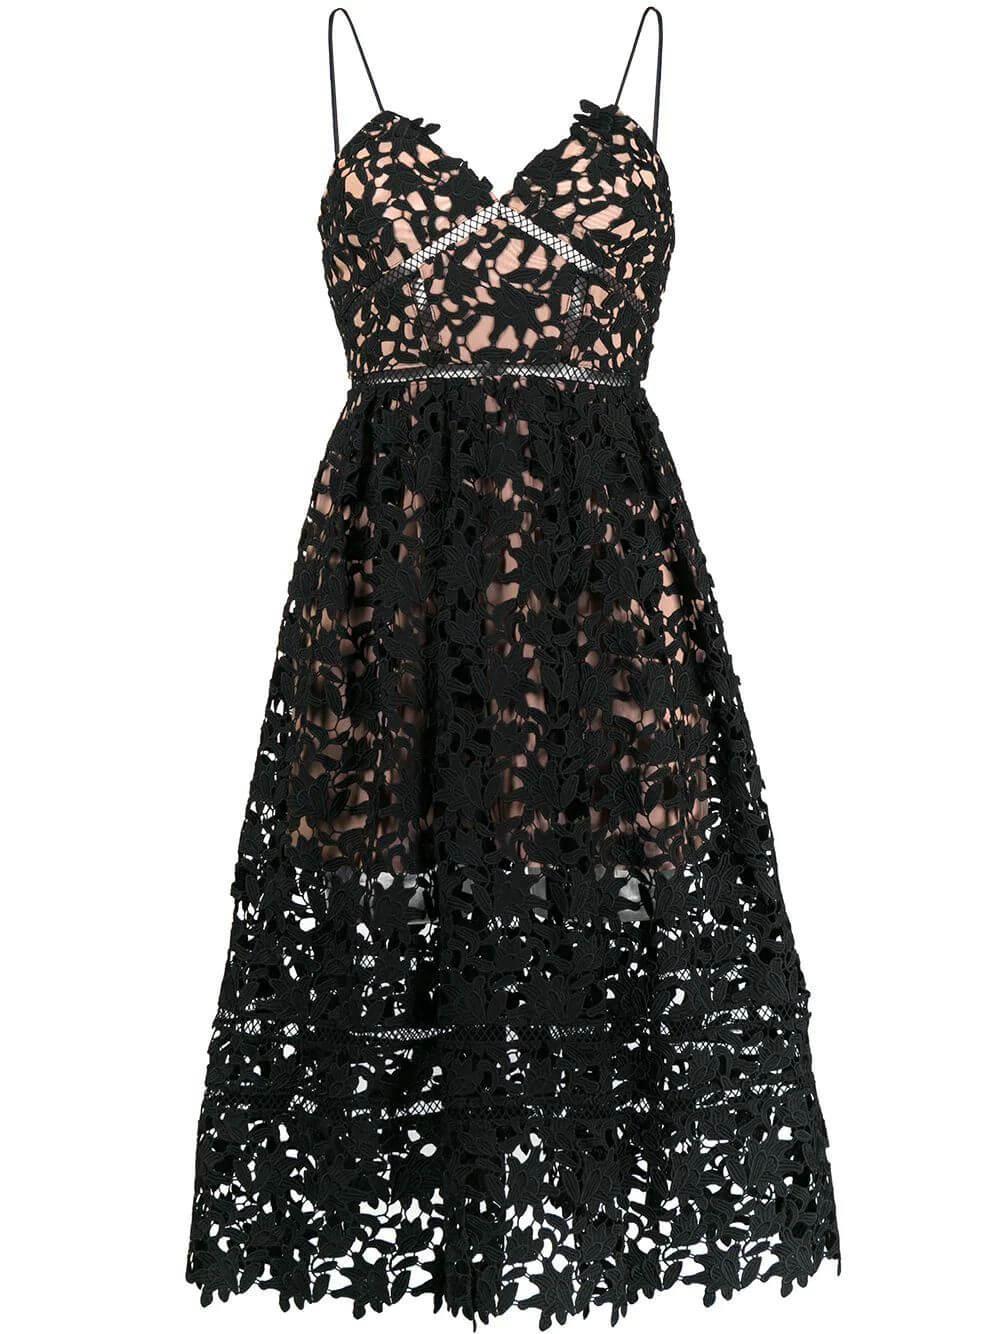 Azaelea Midi Dress Item # AW20-128